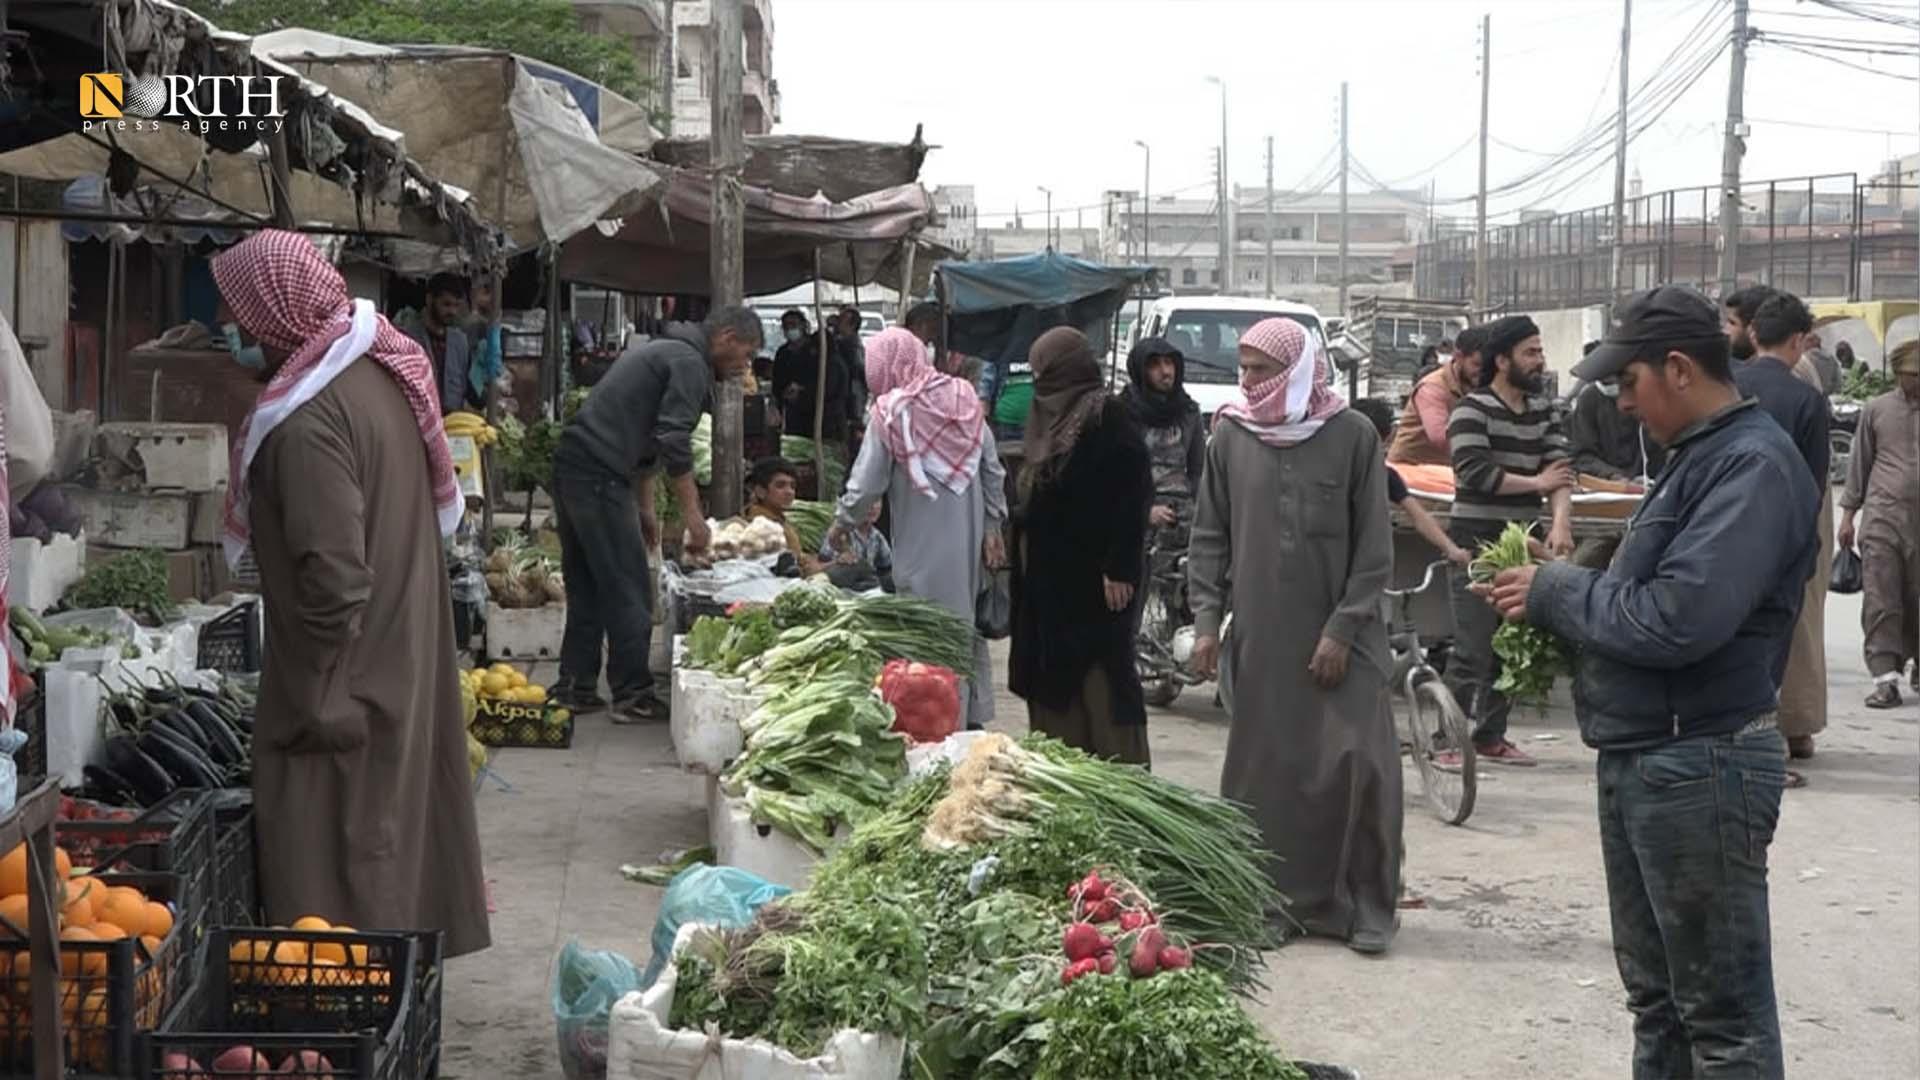 Shopping in al-Hal Market in Manbij – North Press